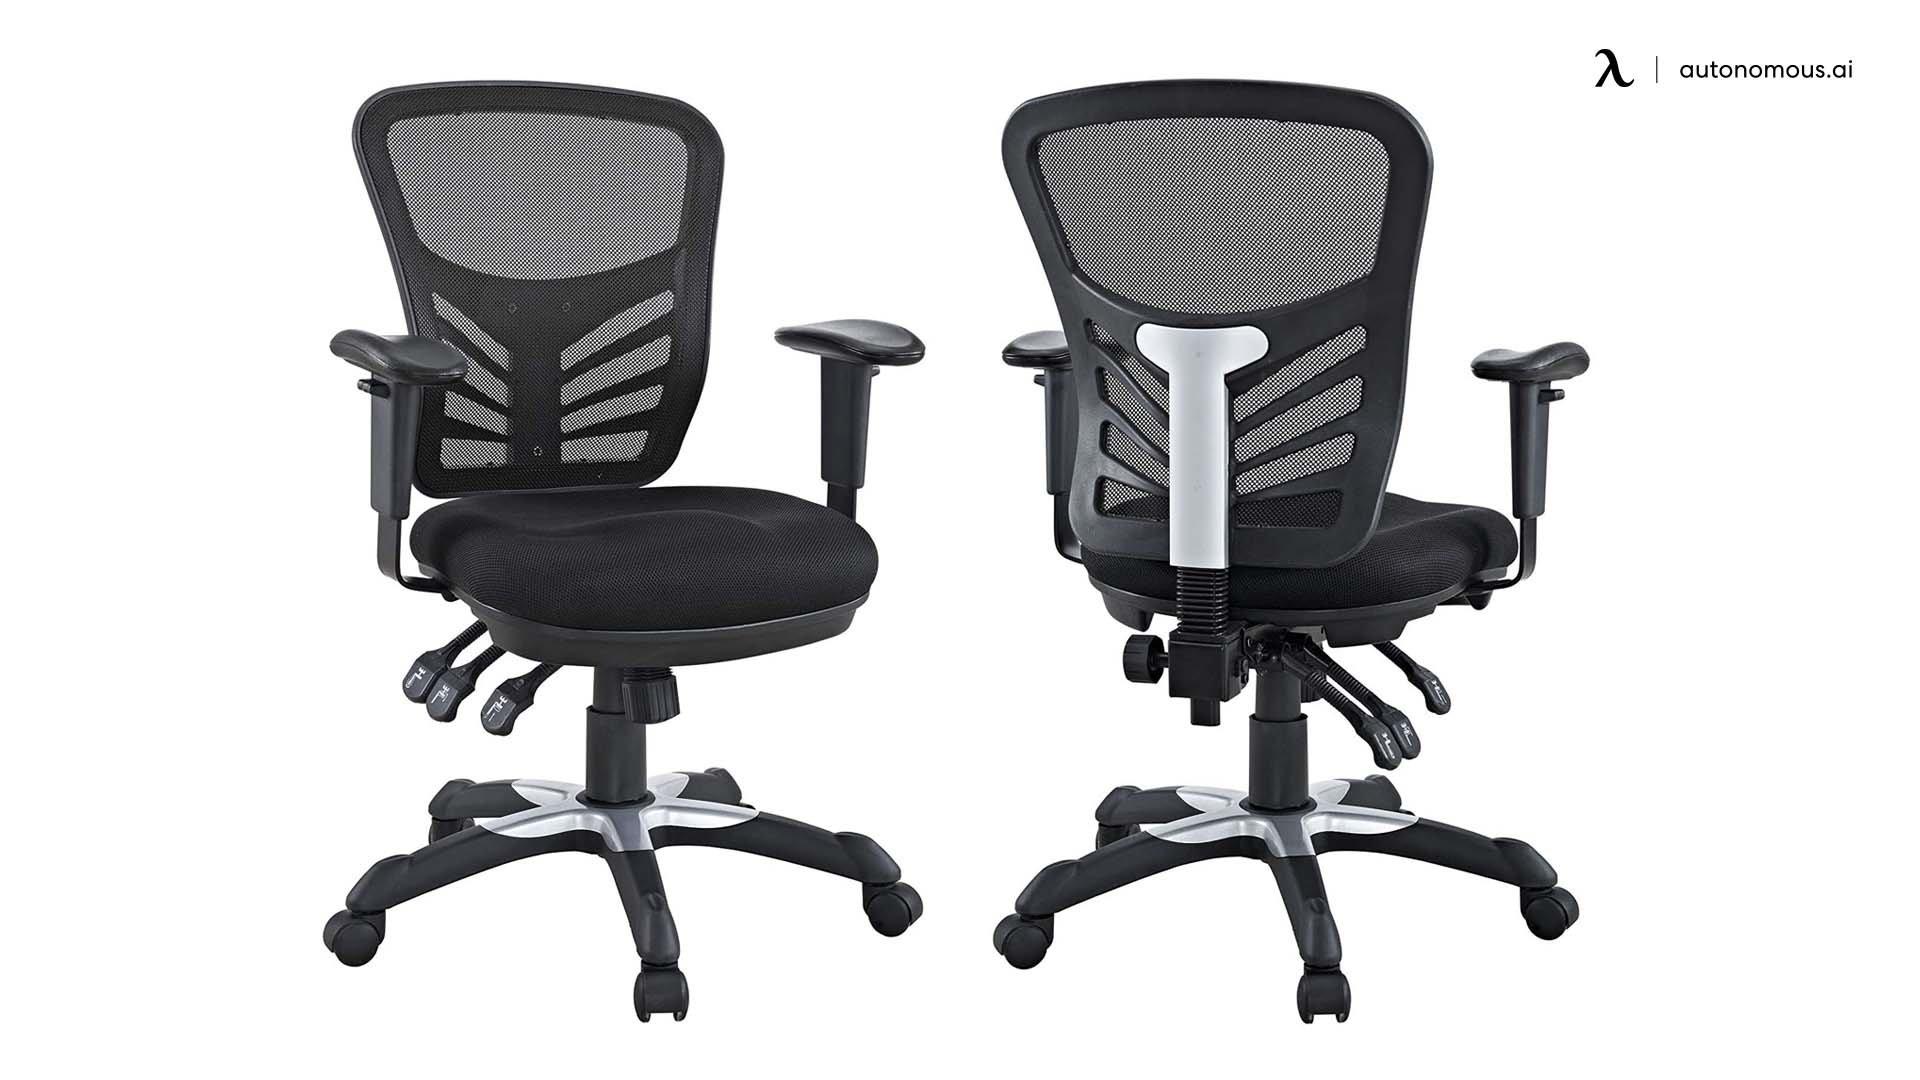 Modway Articulate Chair